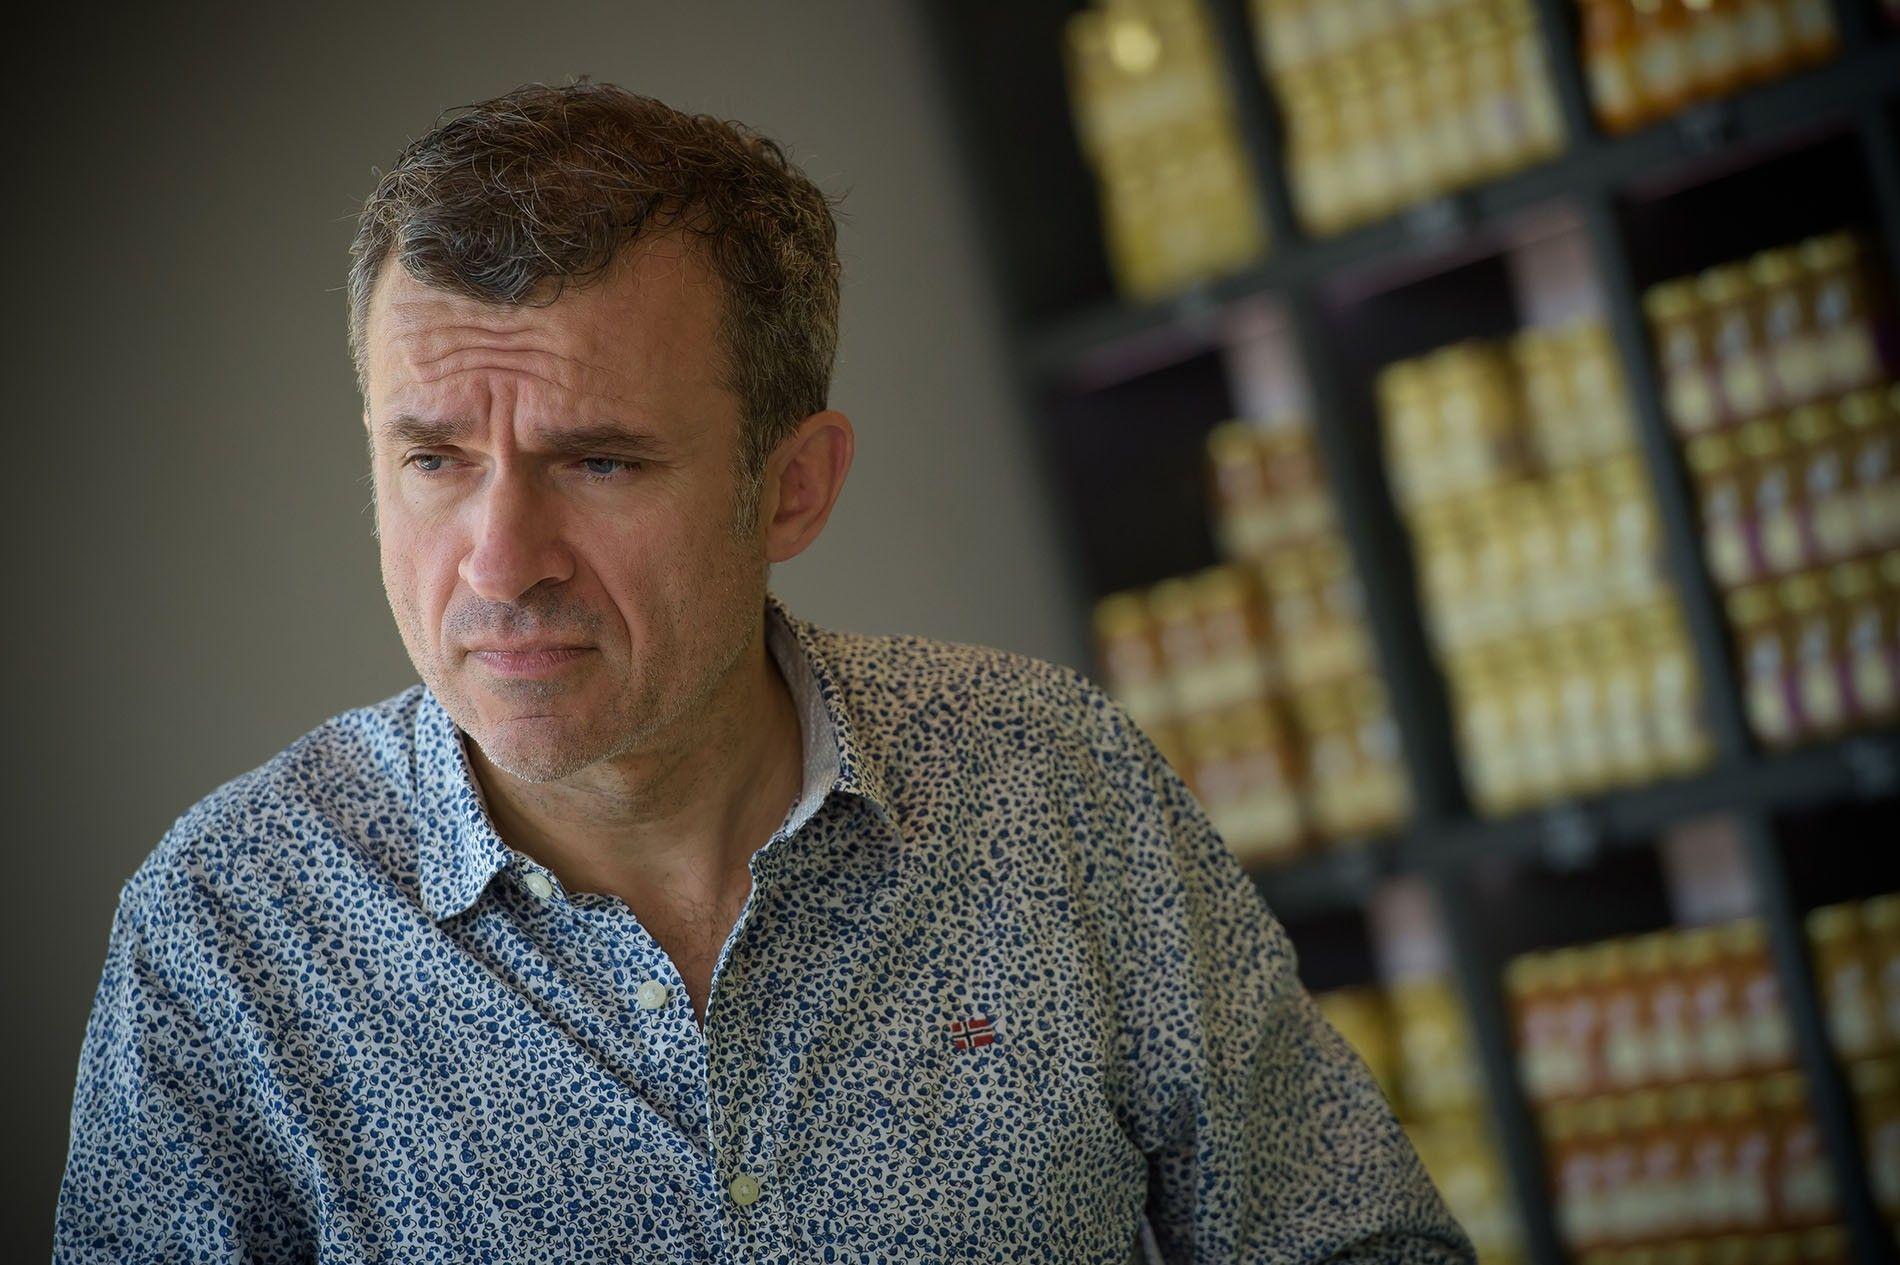 Meet Marc Désarménien, the mustard master from Burgundy